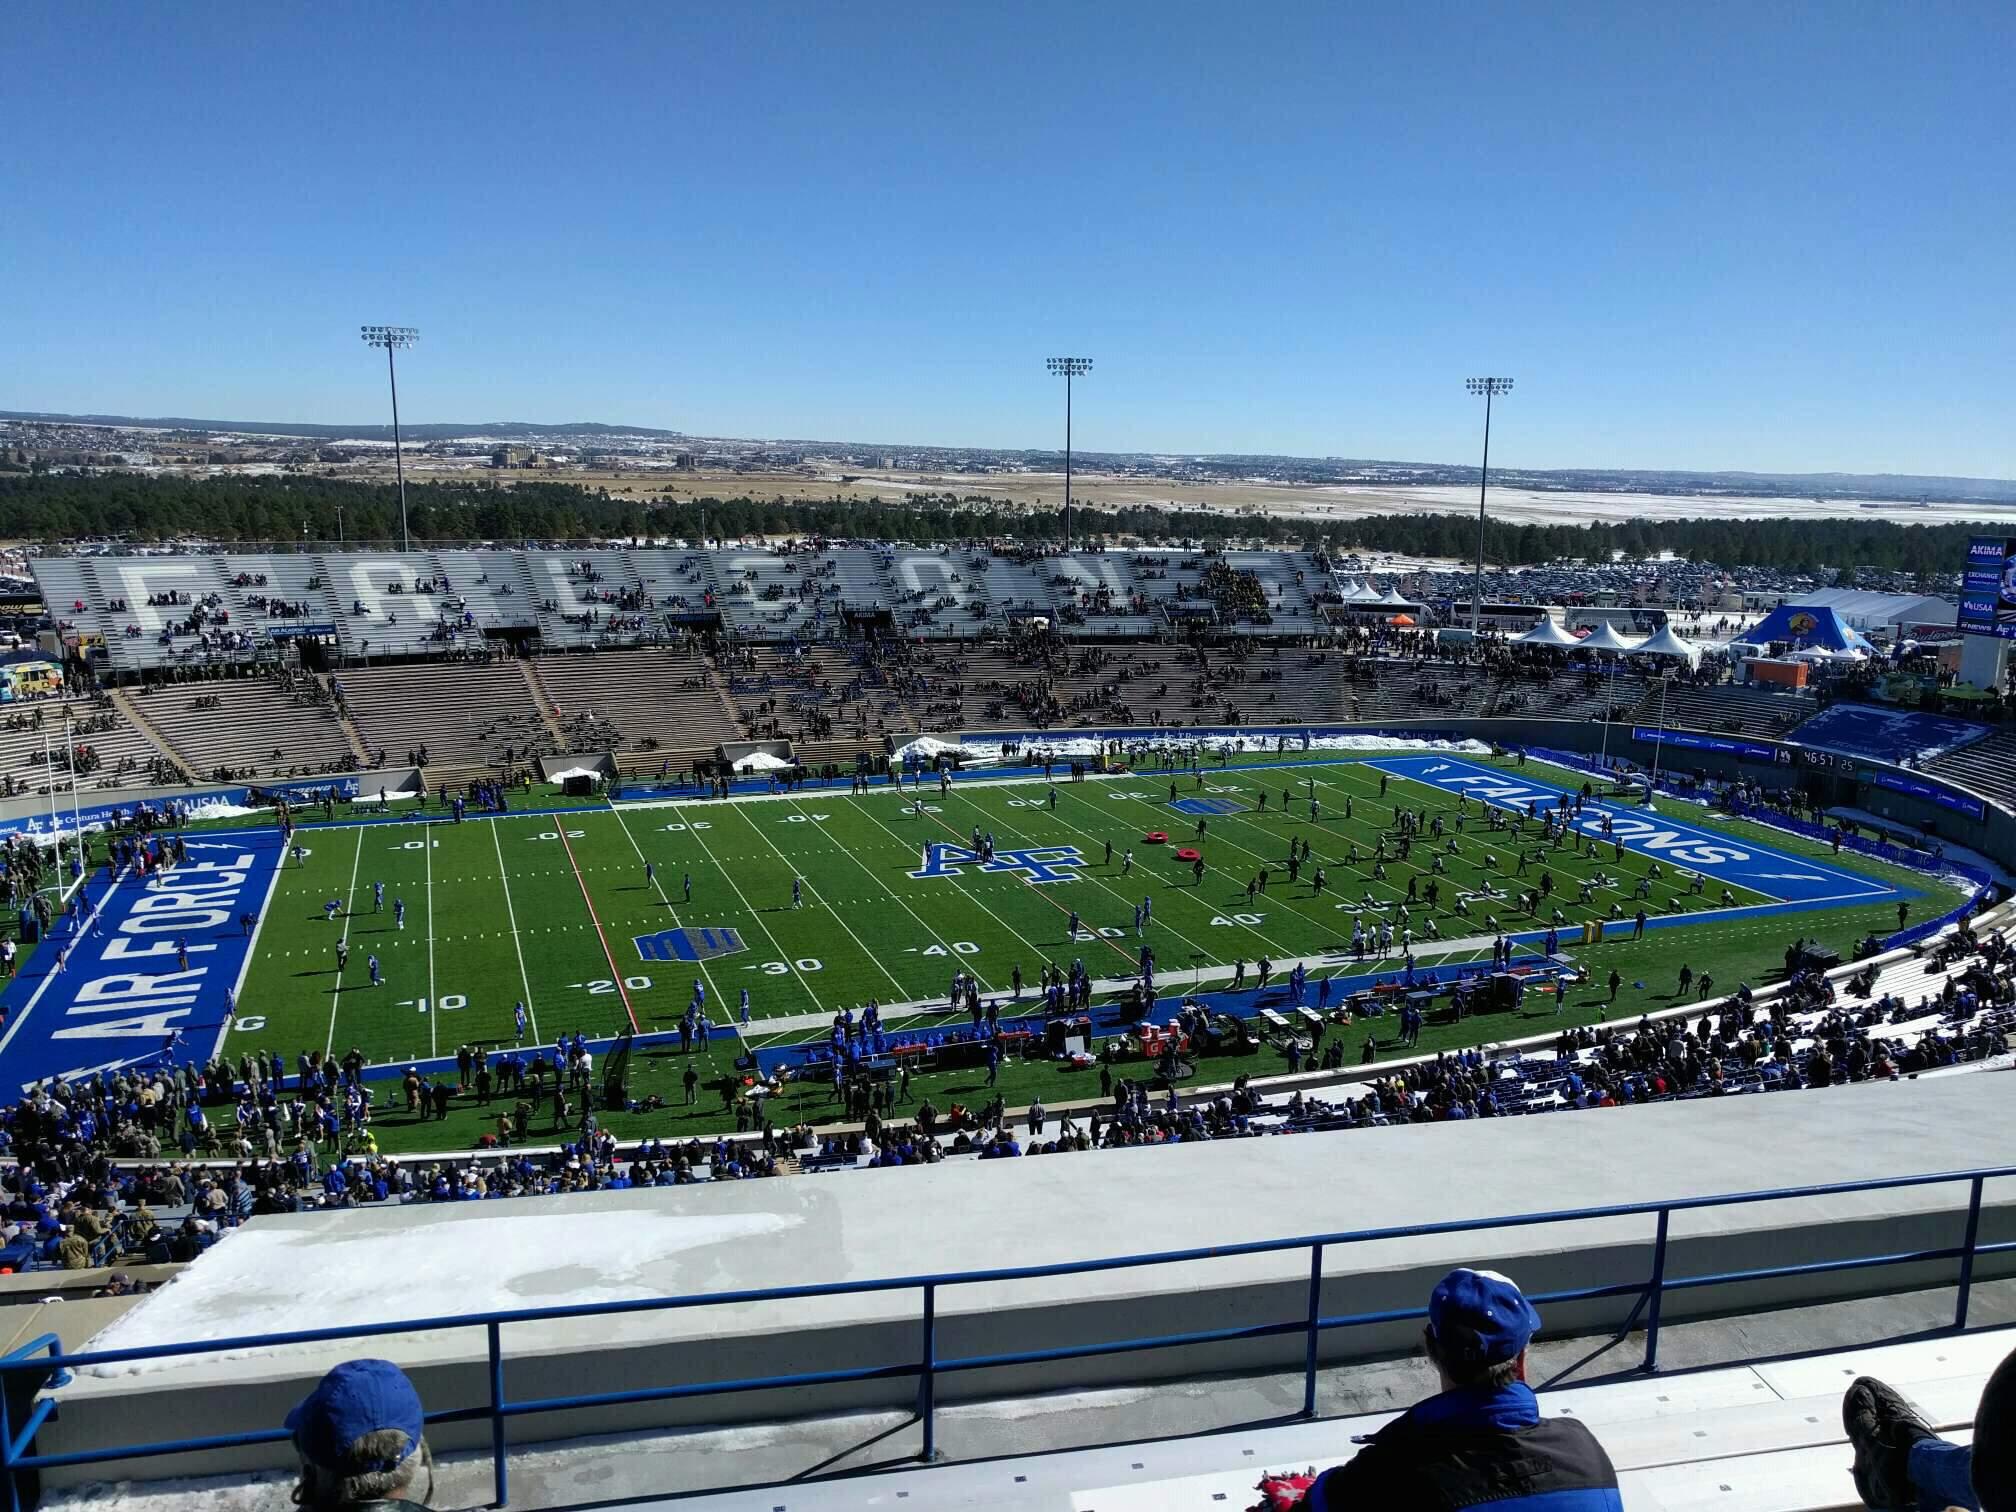 Falcon Stadium Section u9 Row n Seat 9